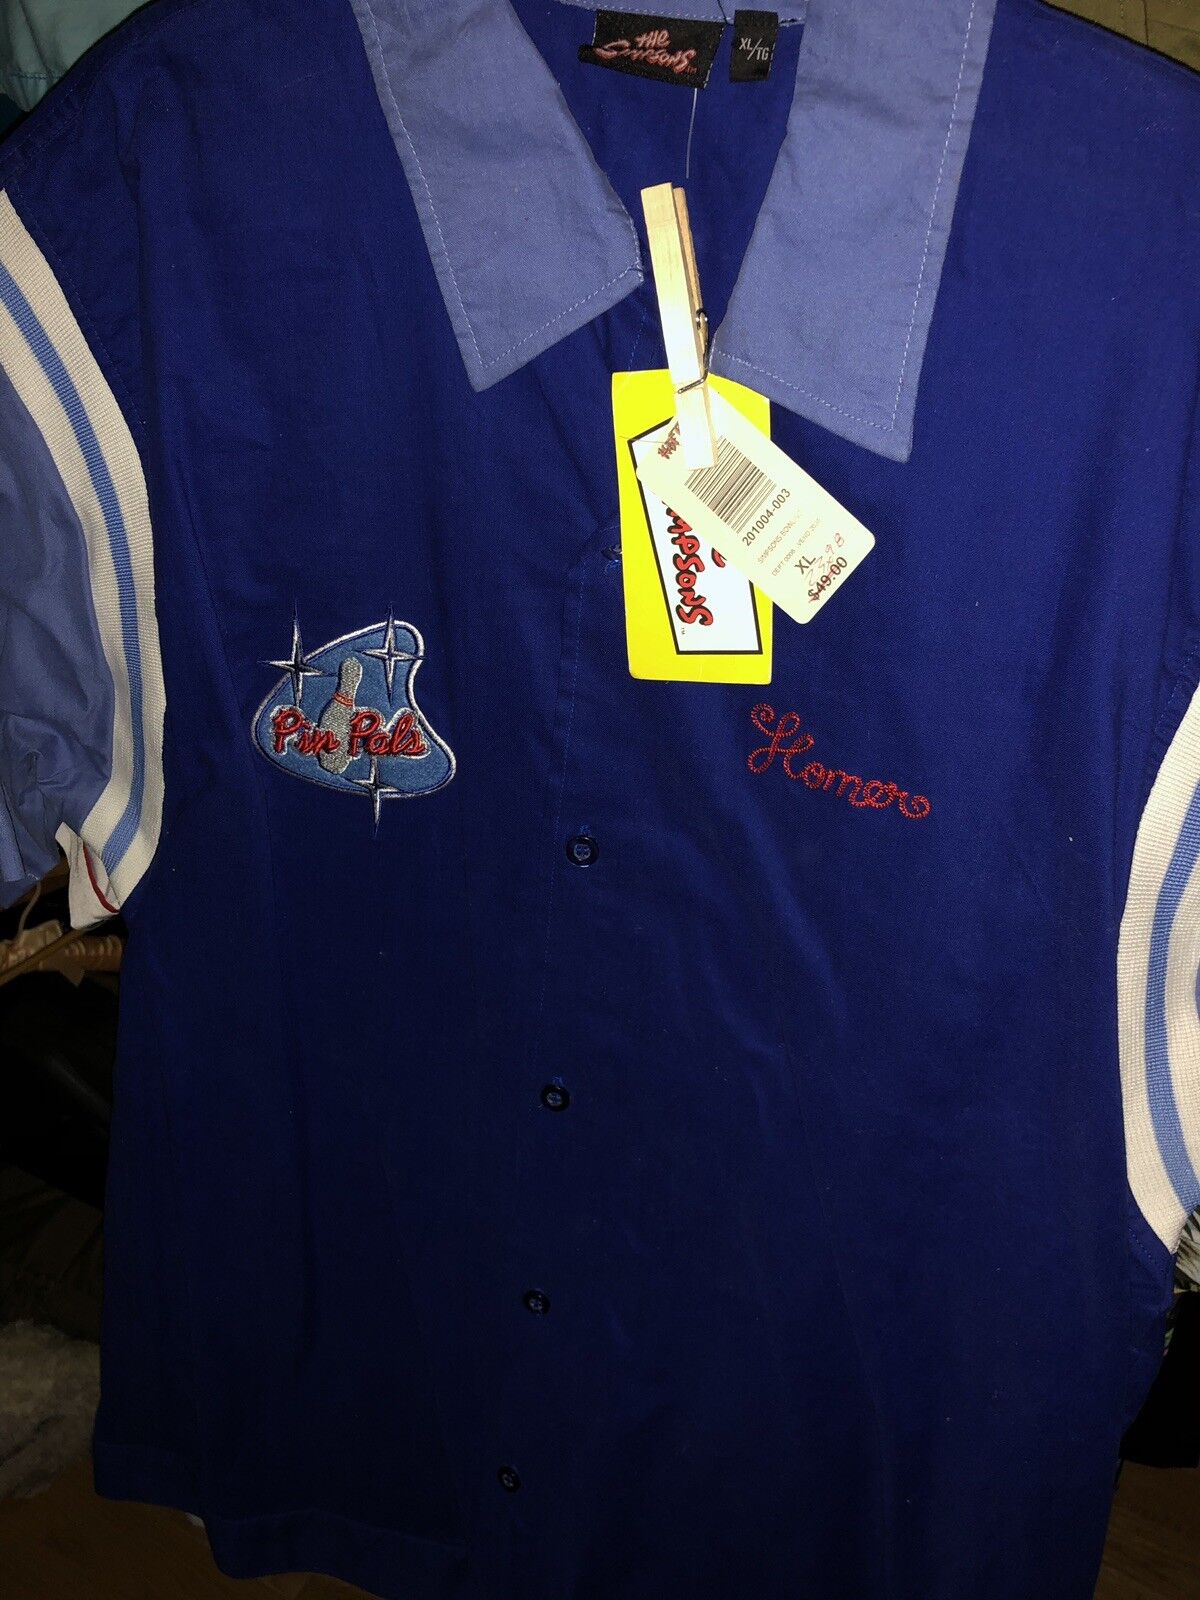 The Simpsons  Springfield Bowling League shirt  NWT  XL